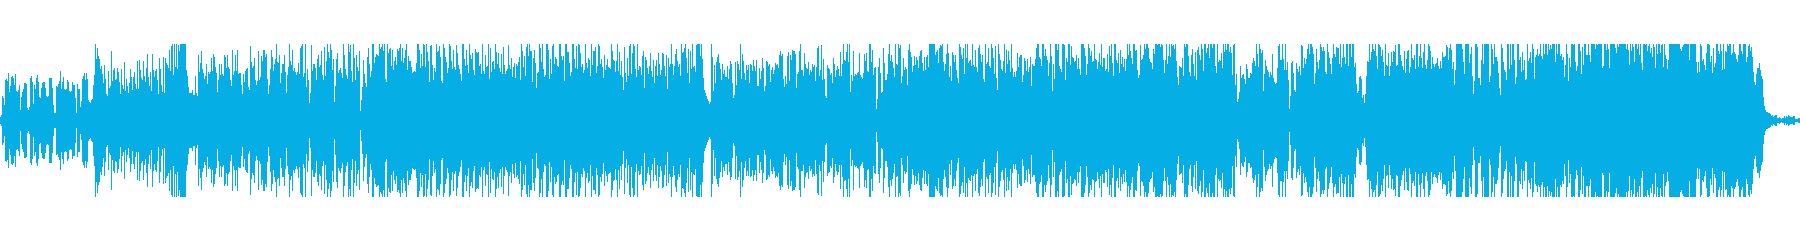 shab◎nの人気作品の再生済みの波形